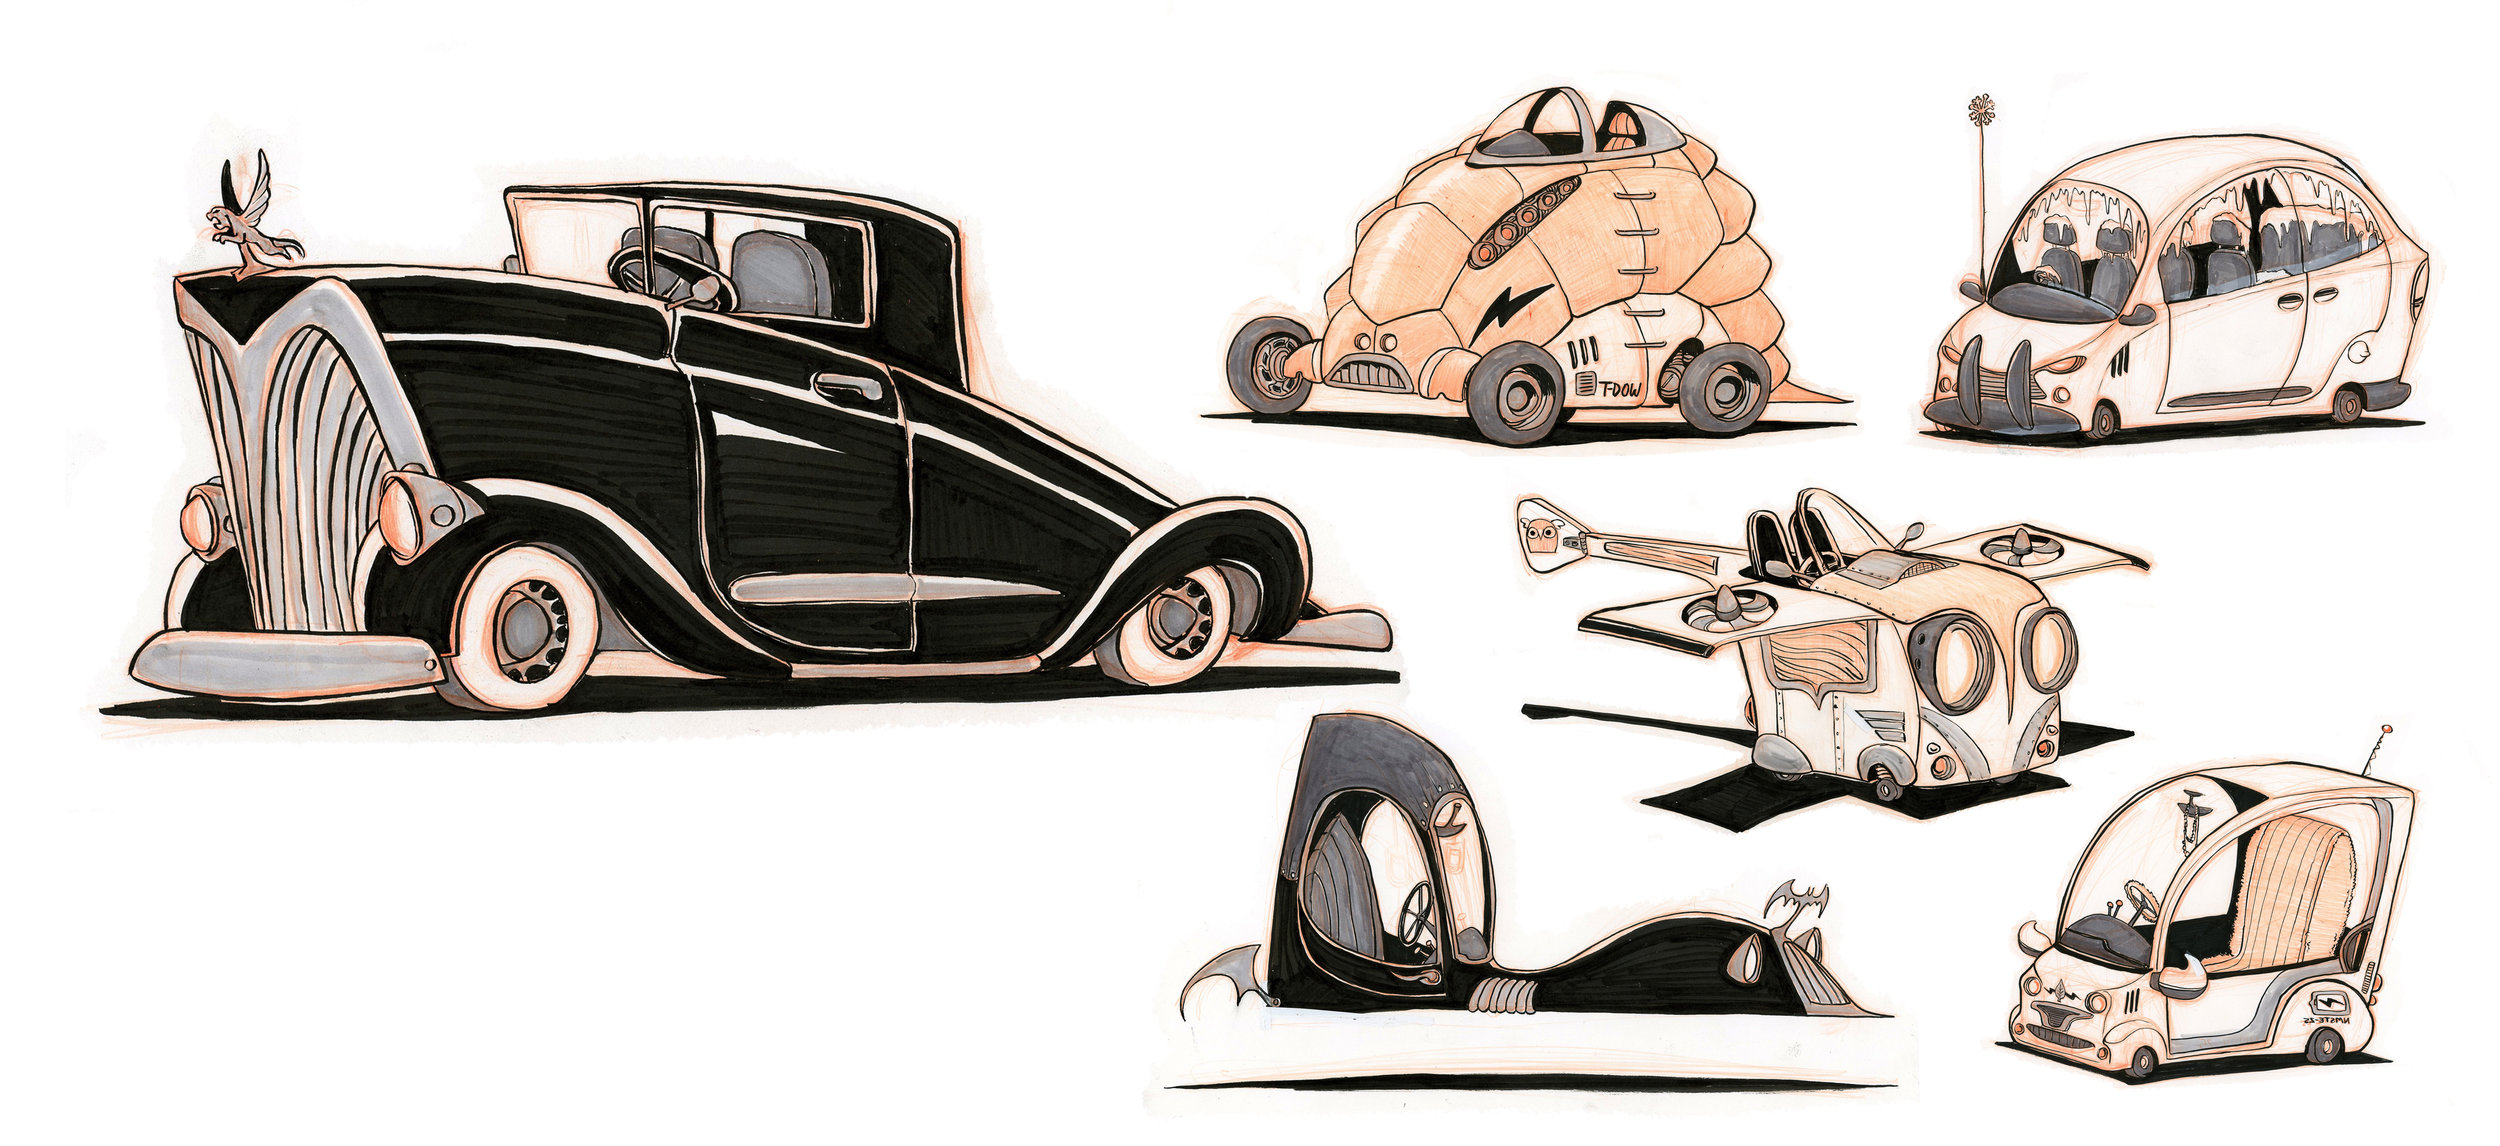 ABC_Vehicles_001.jpg